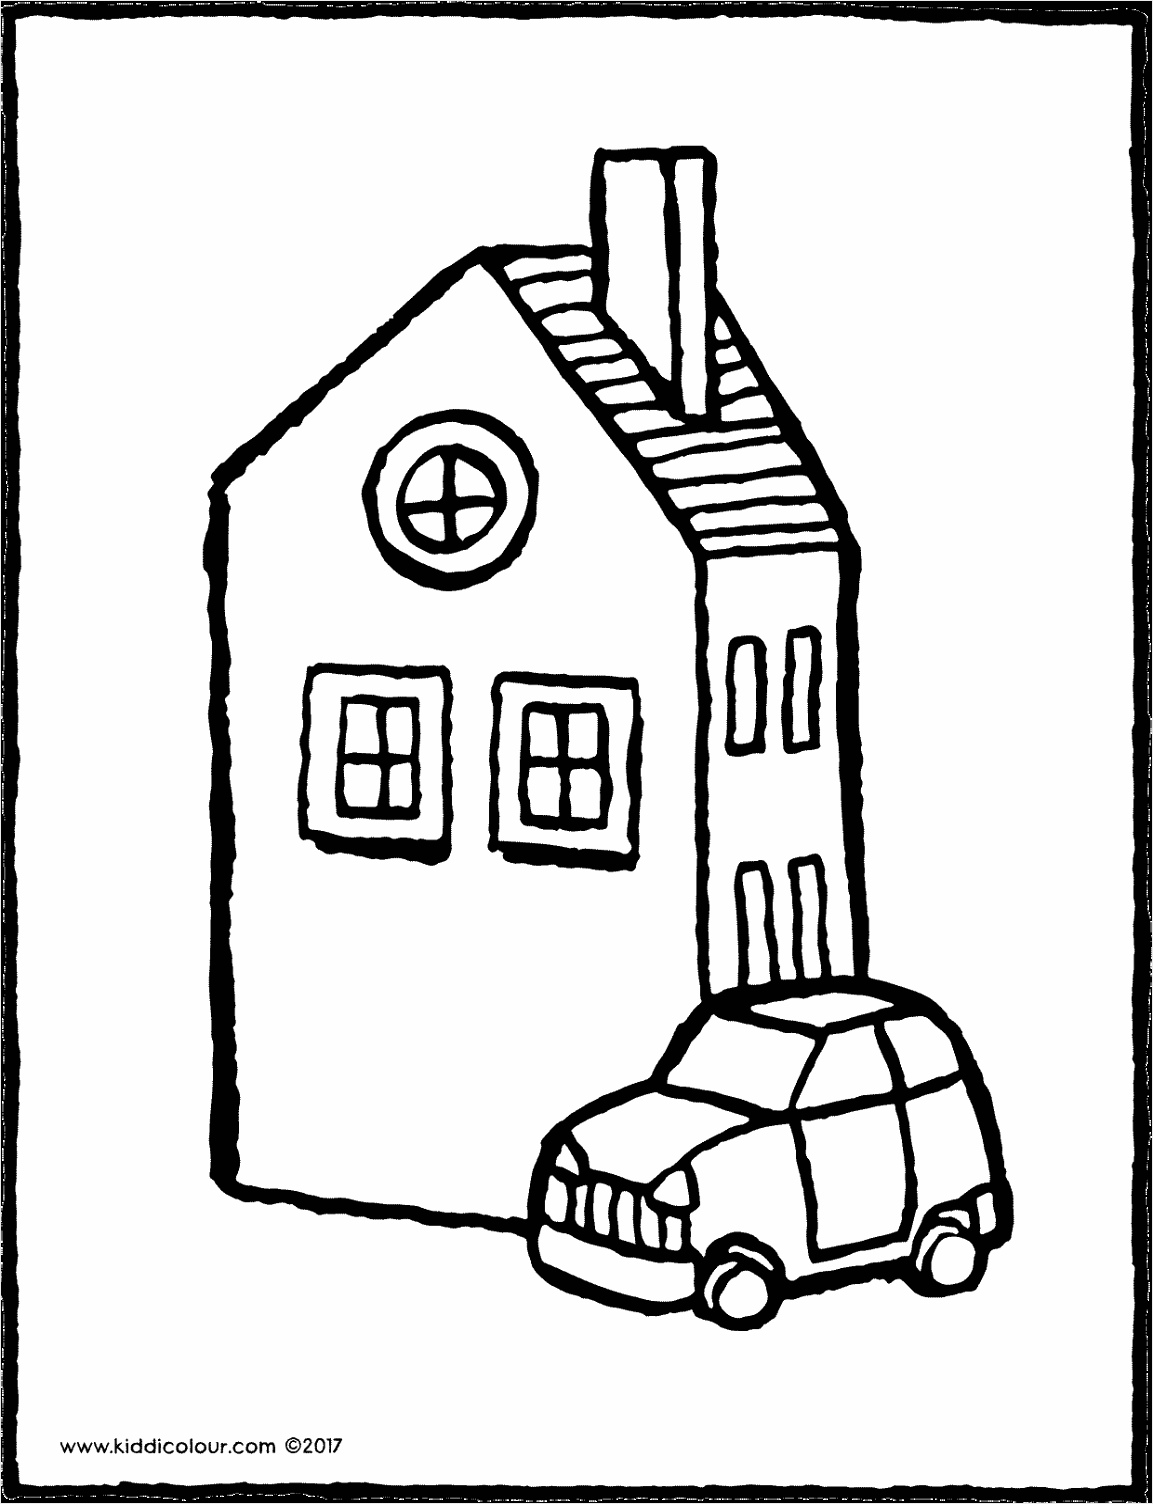 huis met auto kleurplaat kleurprent tekening 02V ujrai